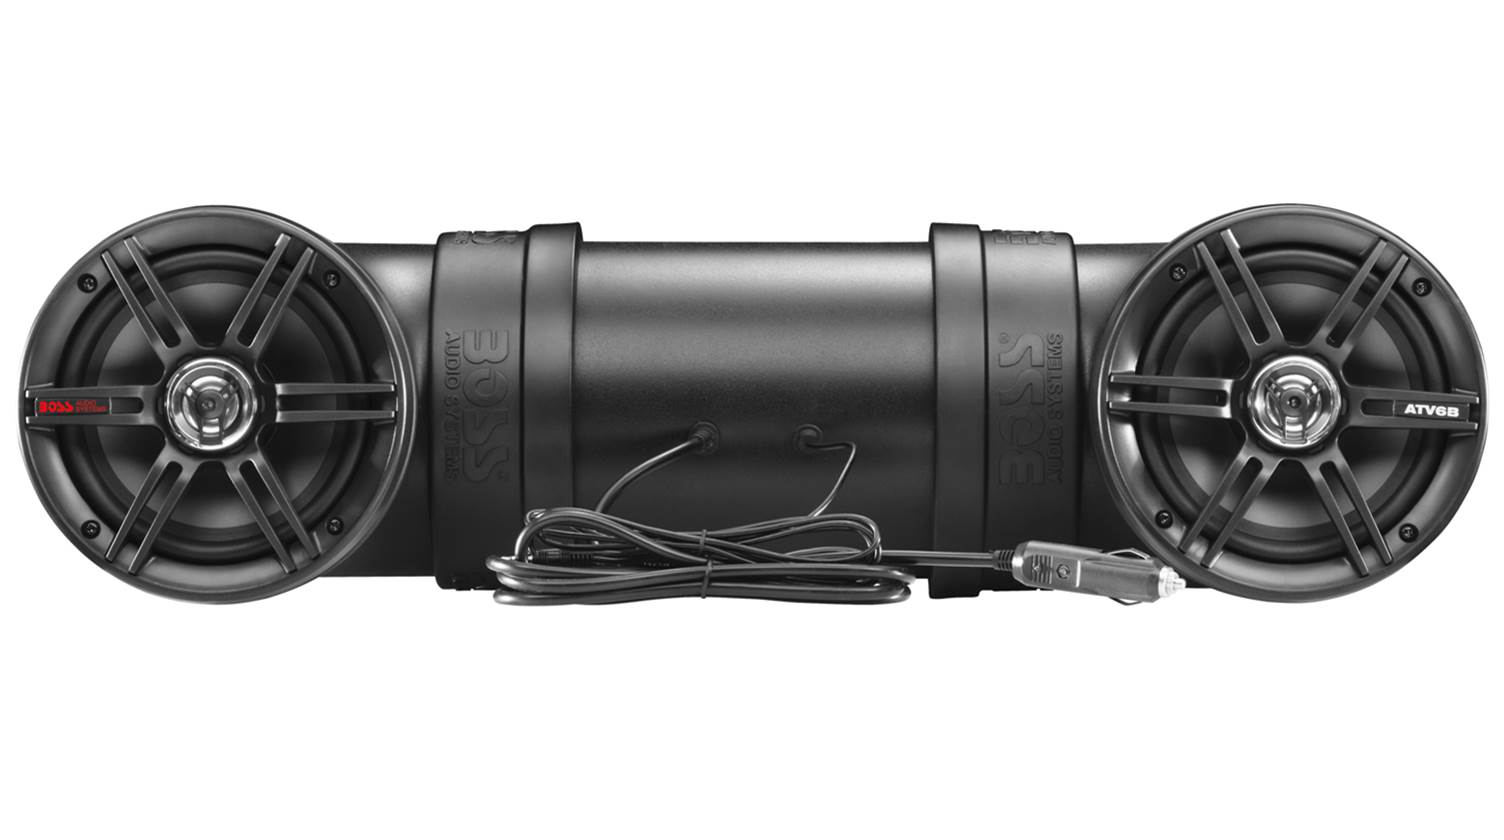 Top 10 Waterproof Atv Speakers Of 2018 Bass Head Bazooka Wiring Harness Boss Audio Atv6b